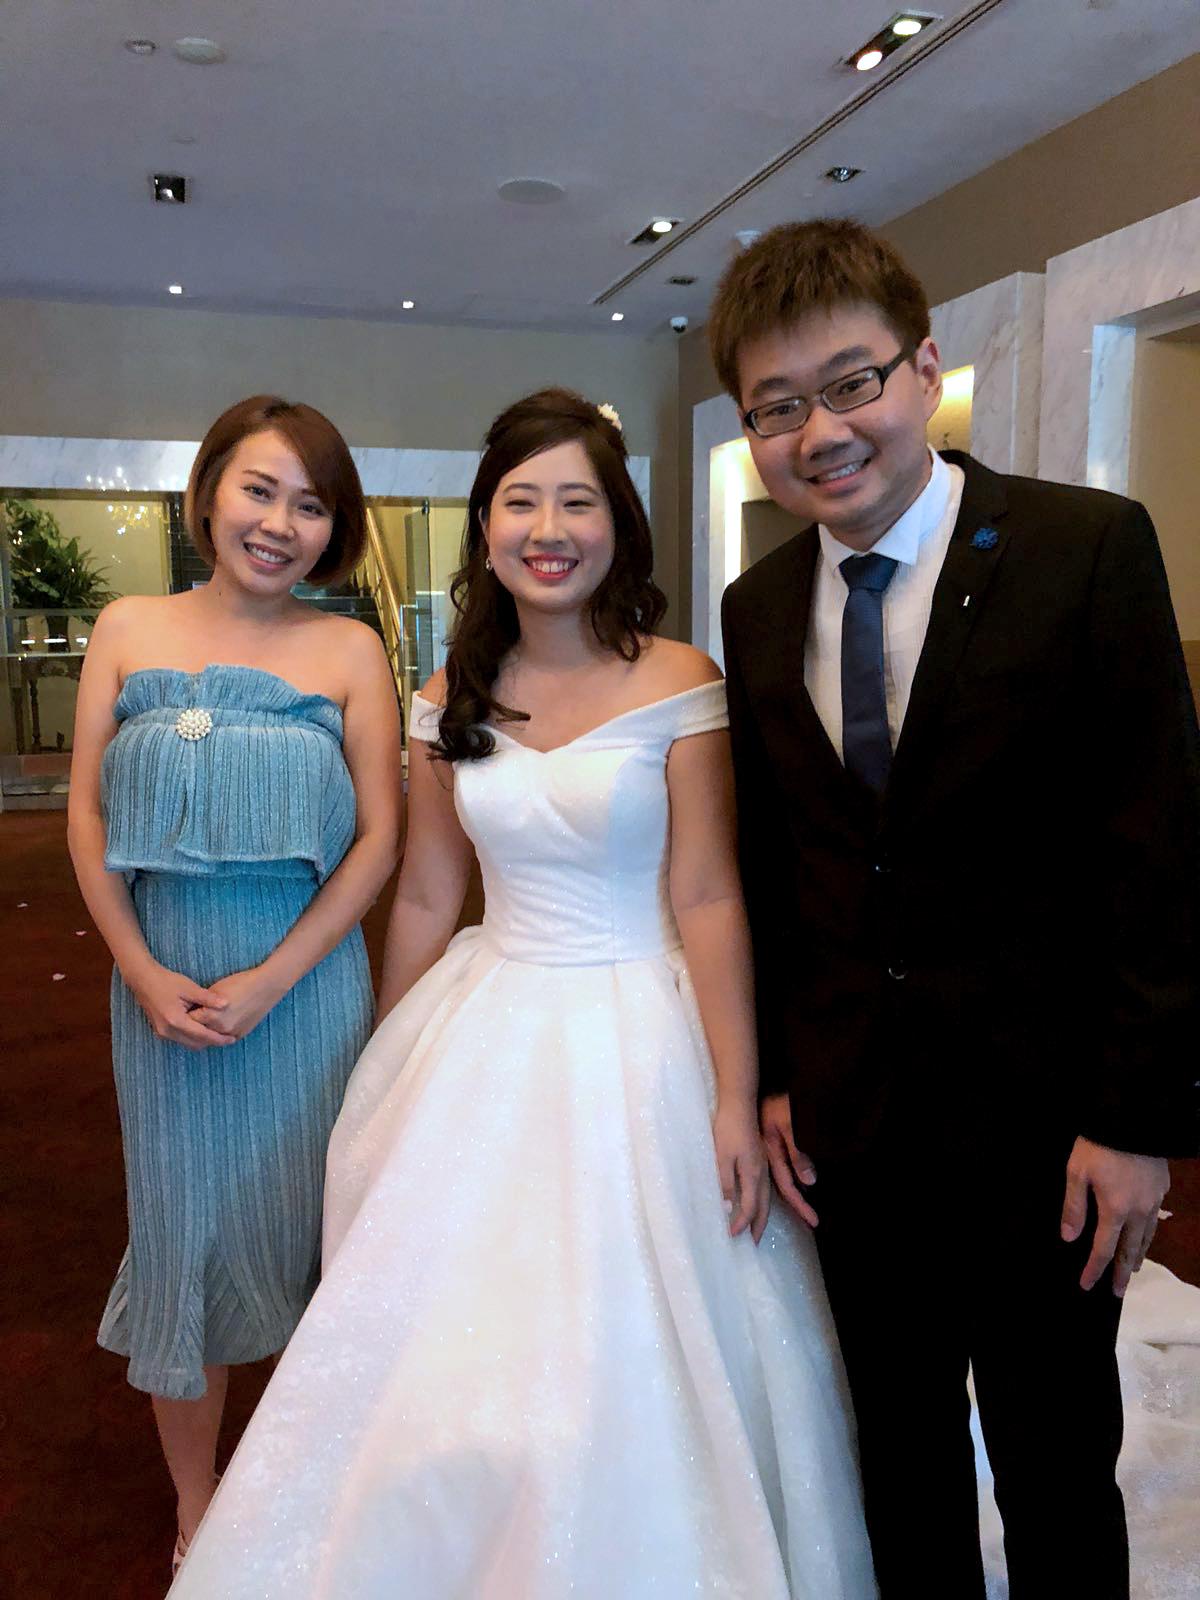 Hotel Fort Canning Lavender Ballroom Wedding